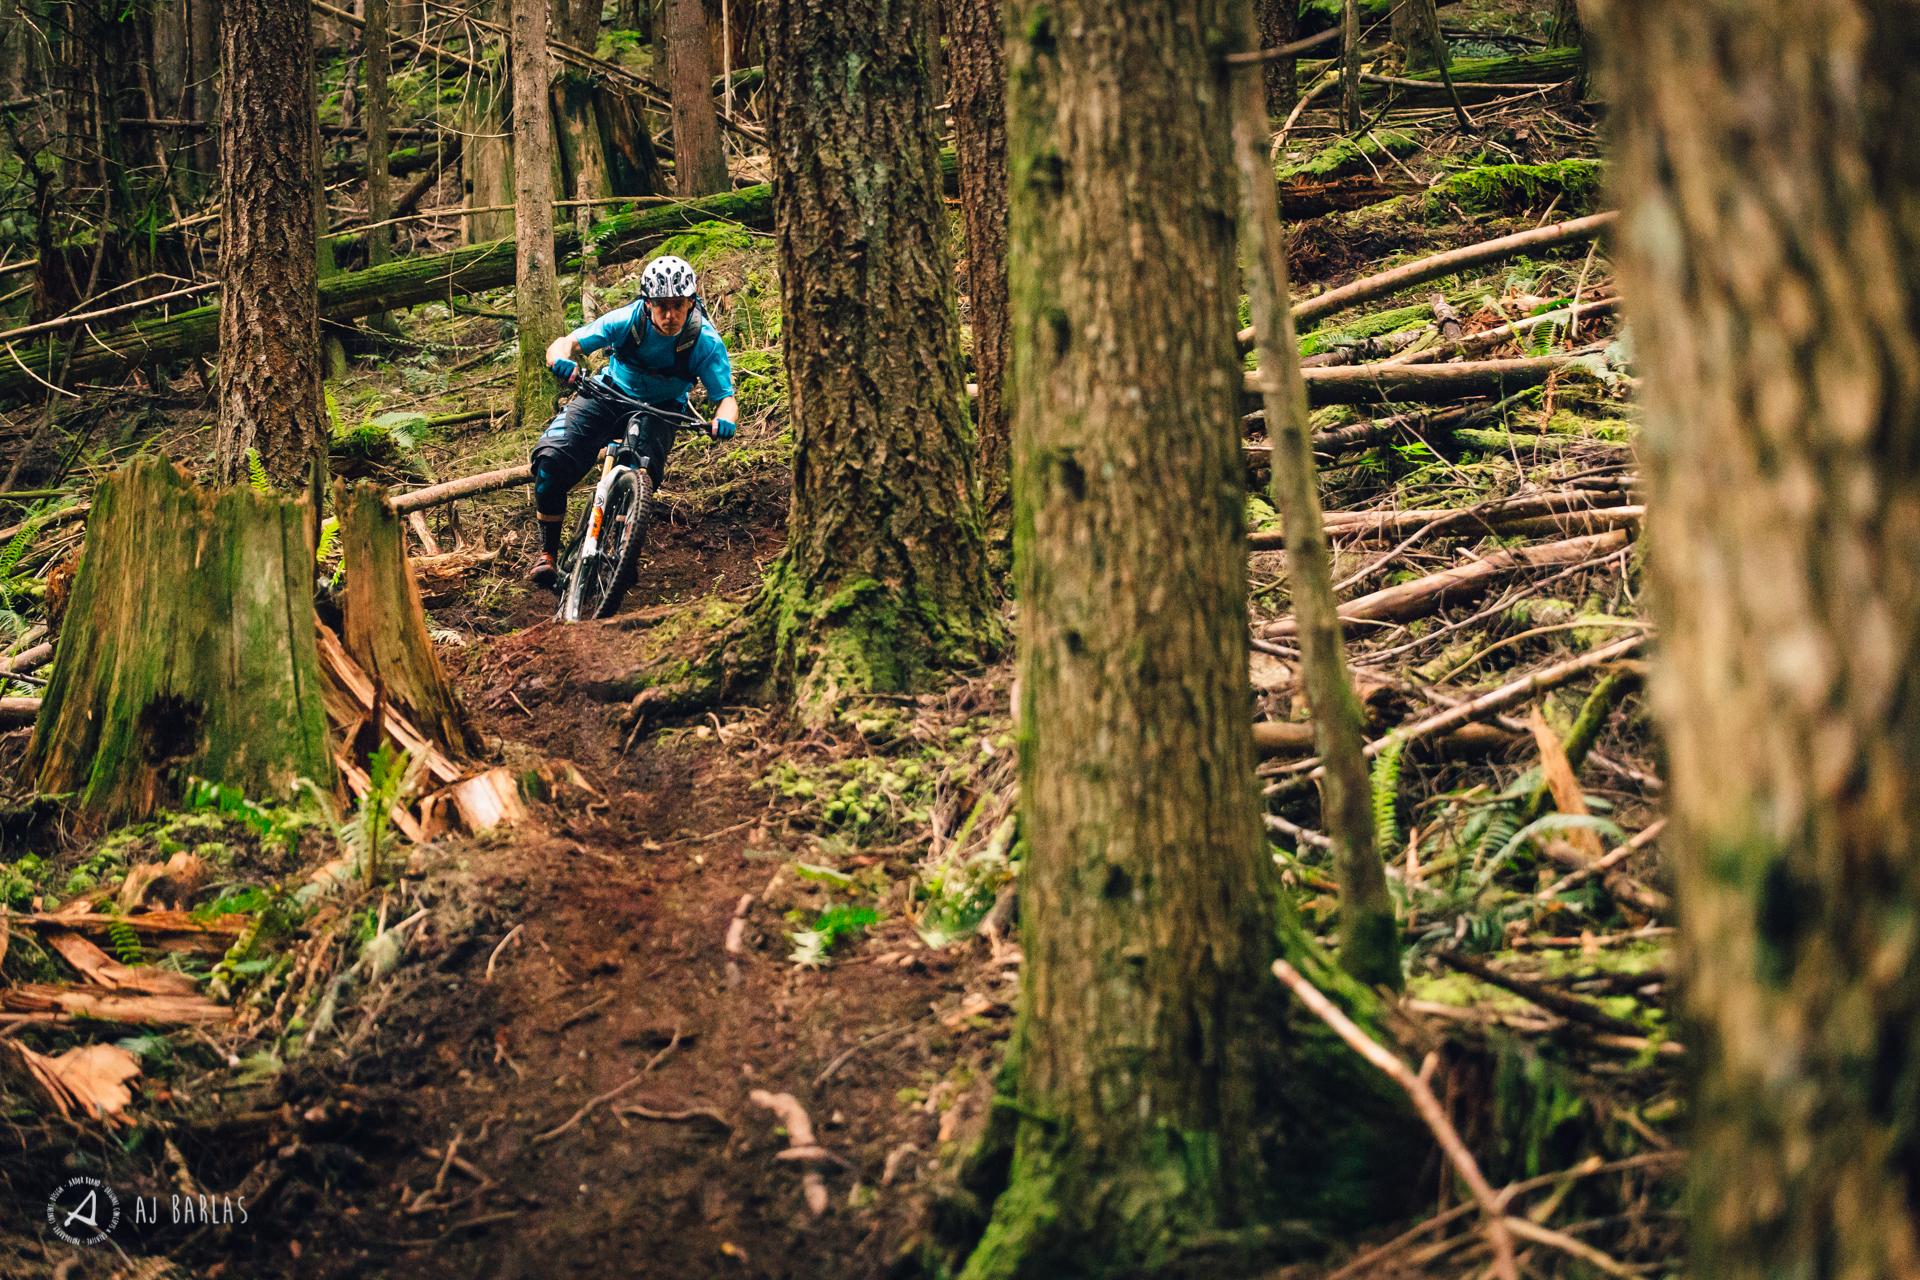 Davis railing some Squamish loam